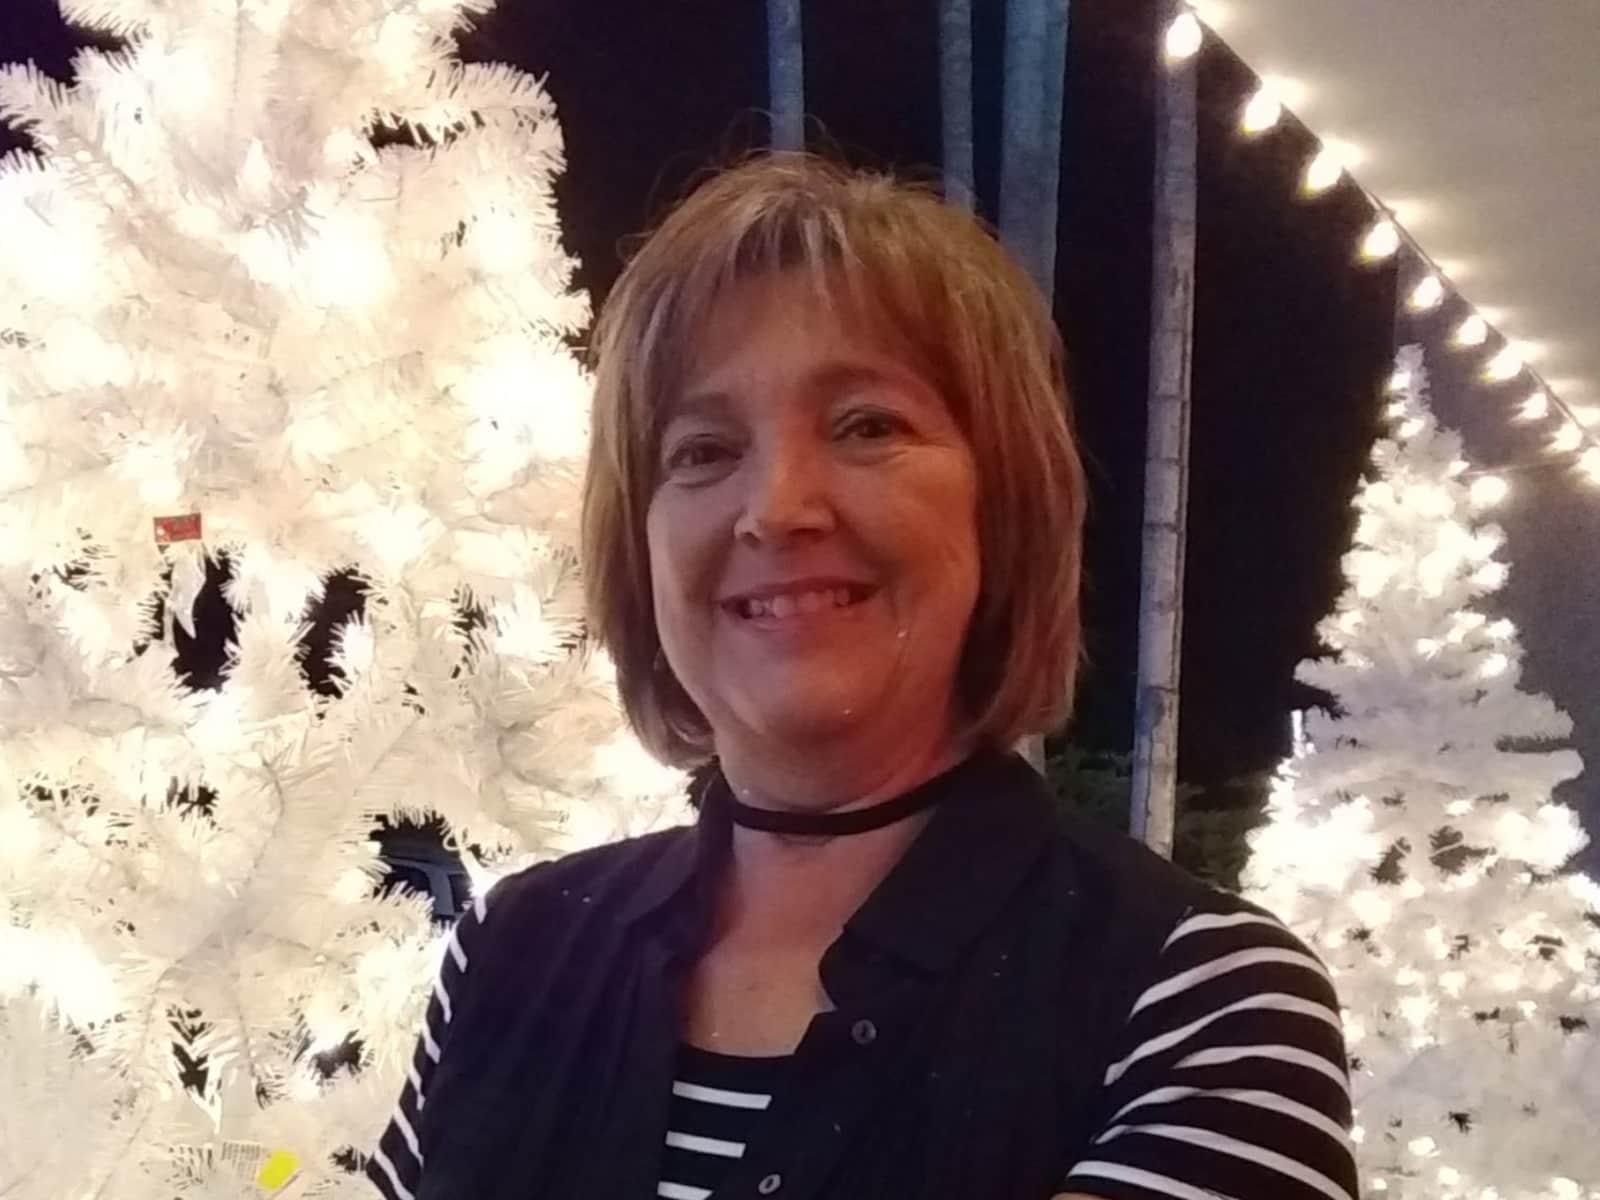 Suzanne from Québec, Quebec, Canada